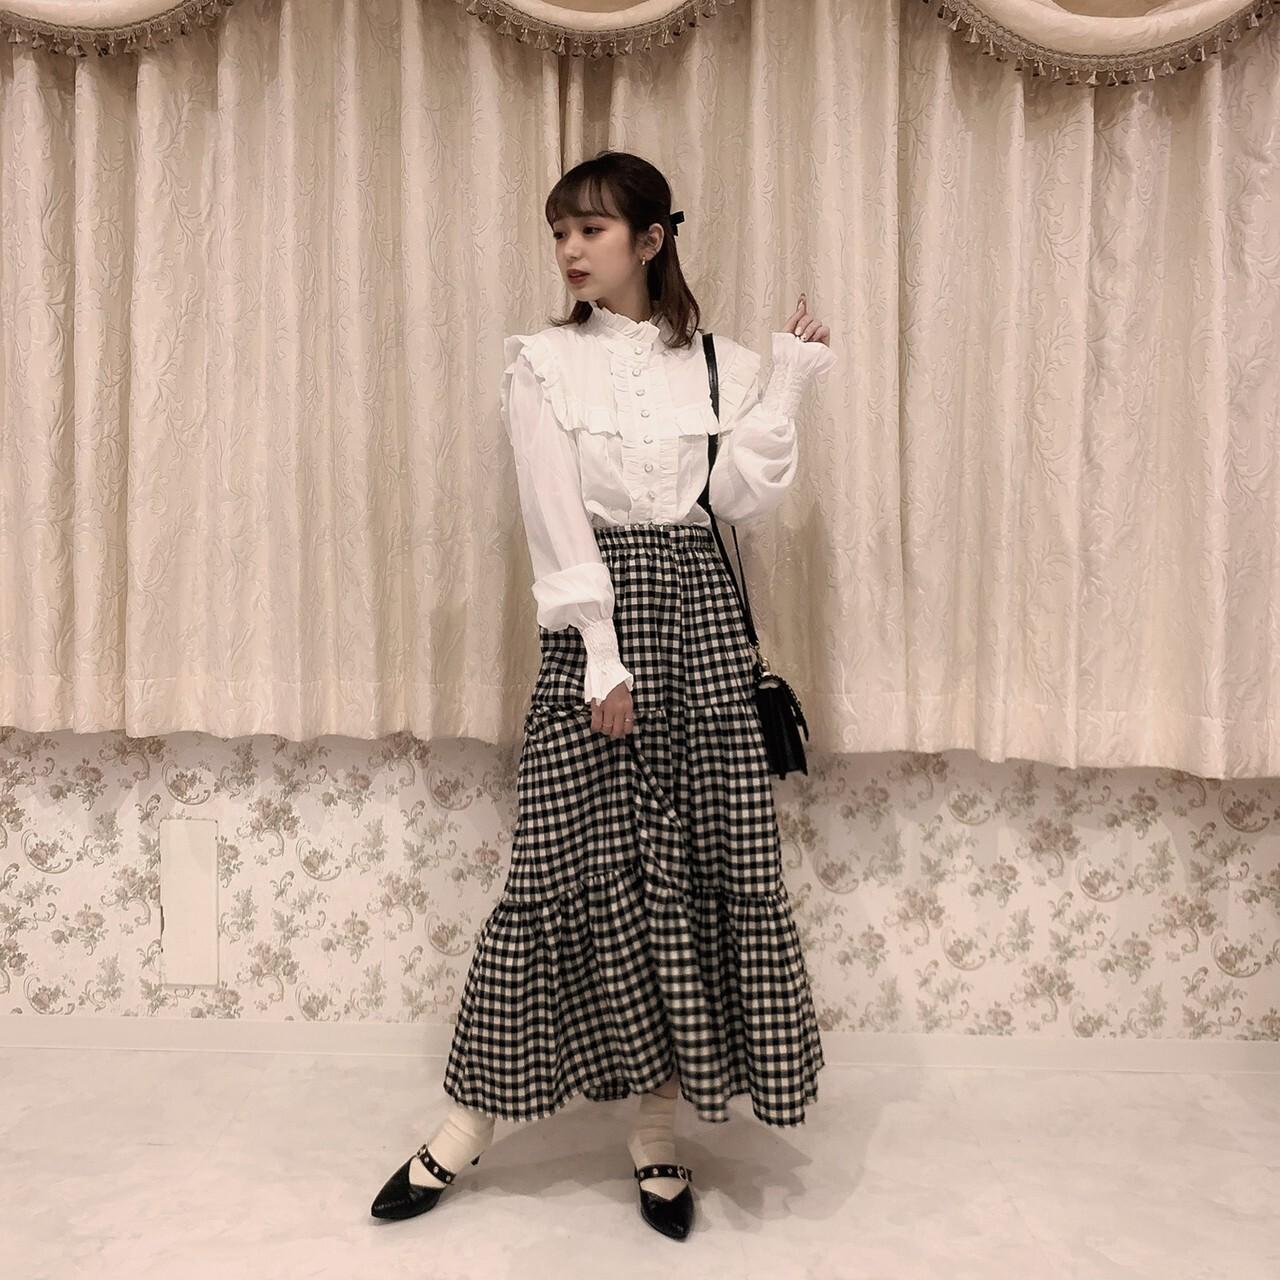 【meltie】gingham tiered skirt